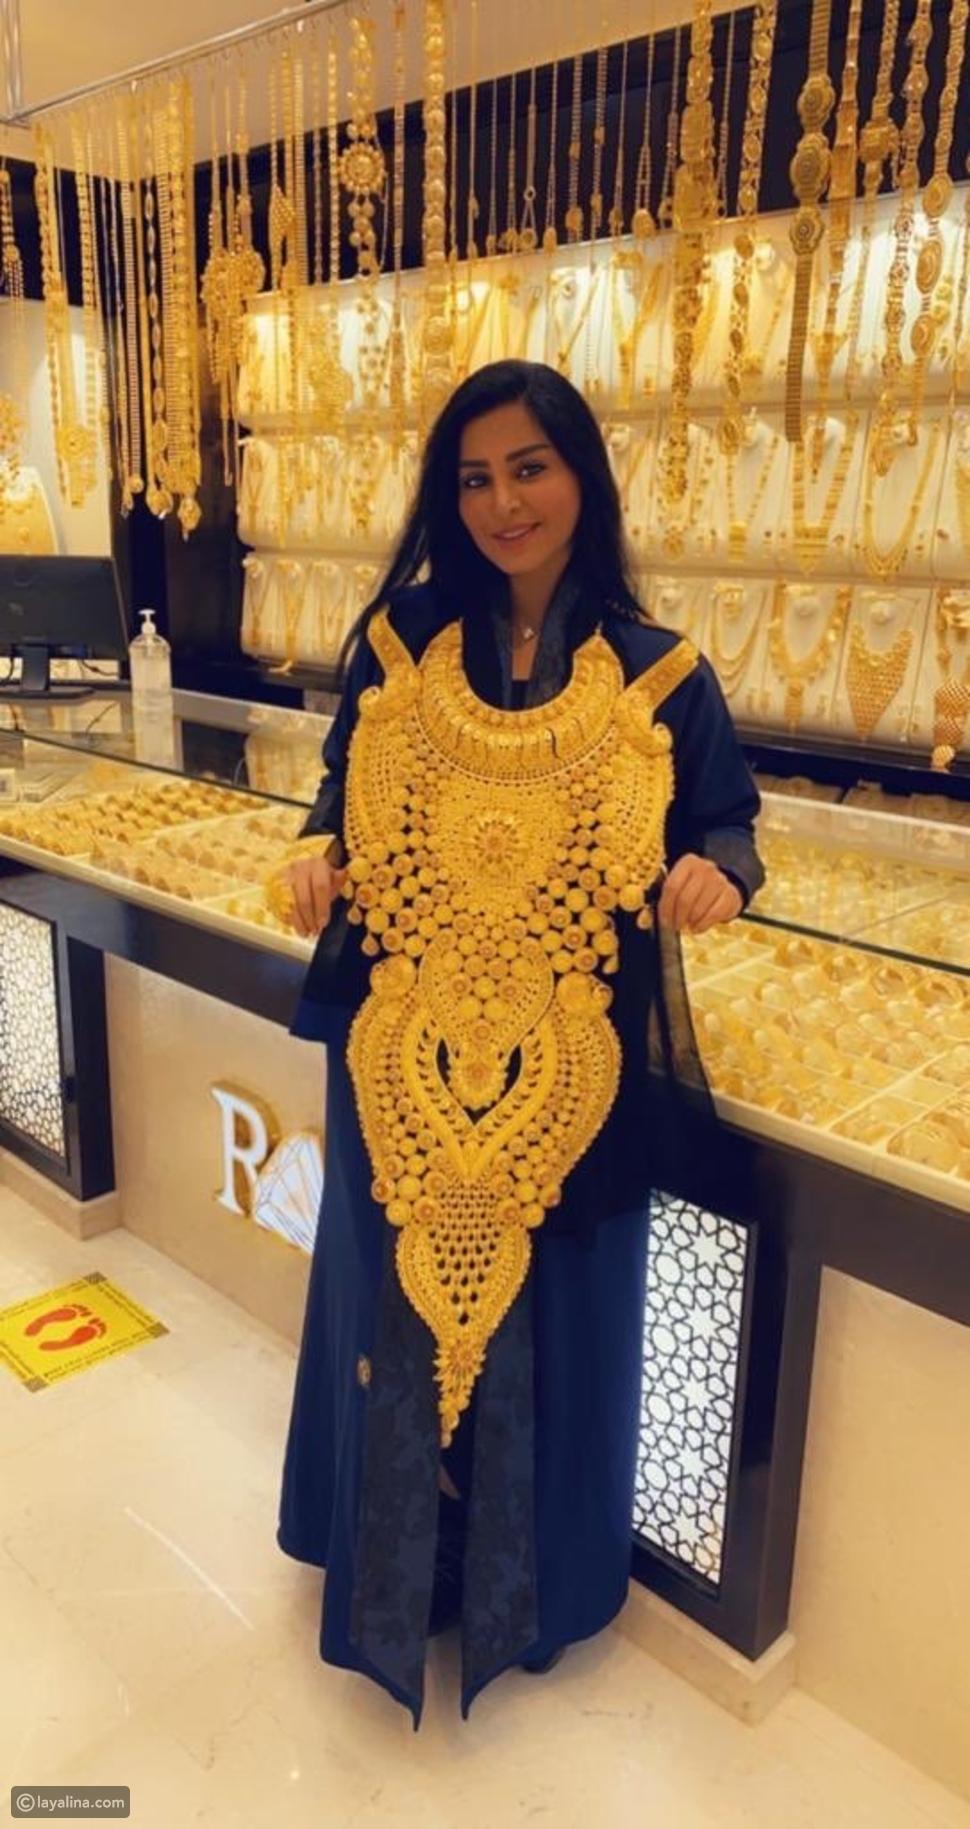 ريم عبدالله تغطي نفسها بالذهب